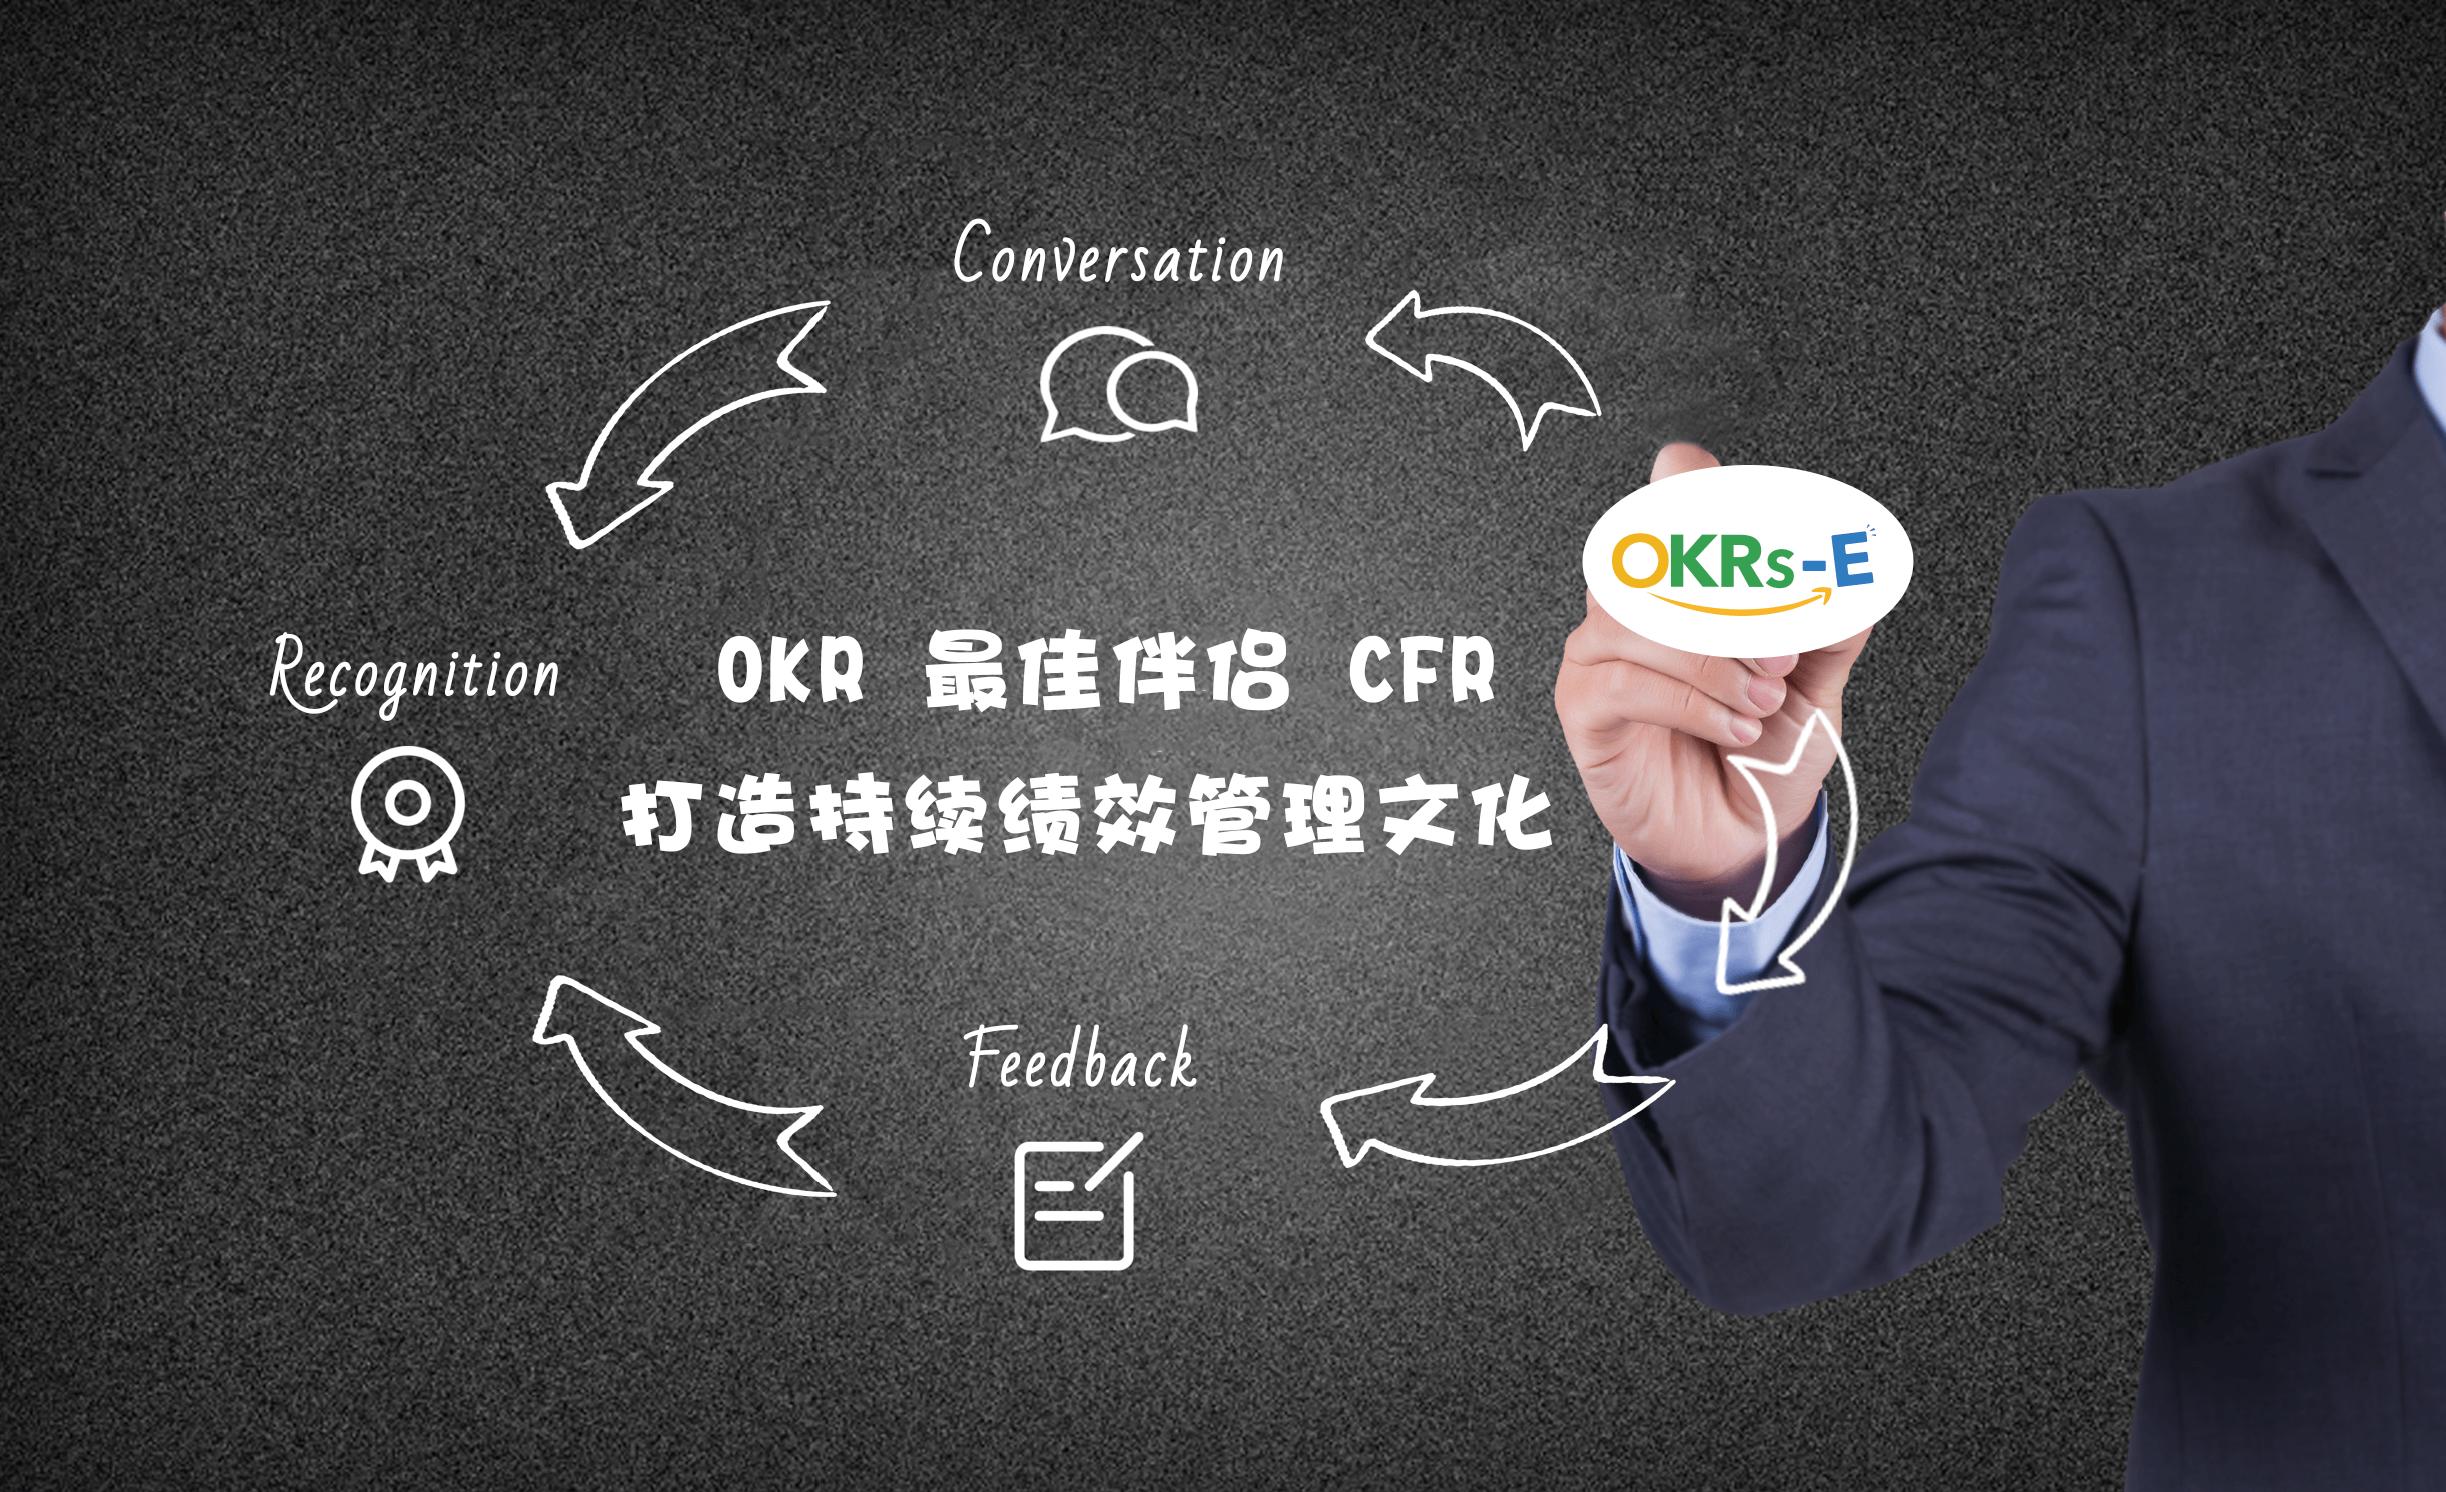 HRD 必须知晓的 OKR 与持续绩效管理